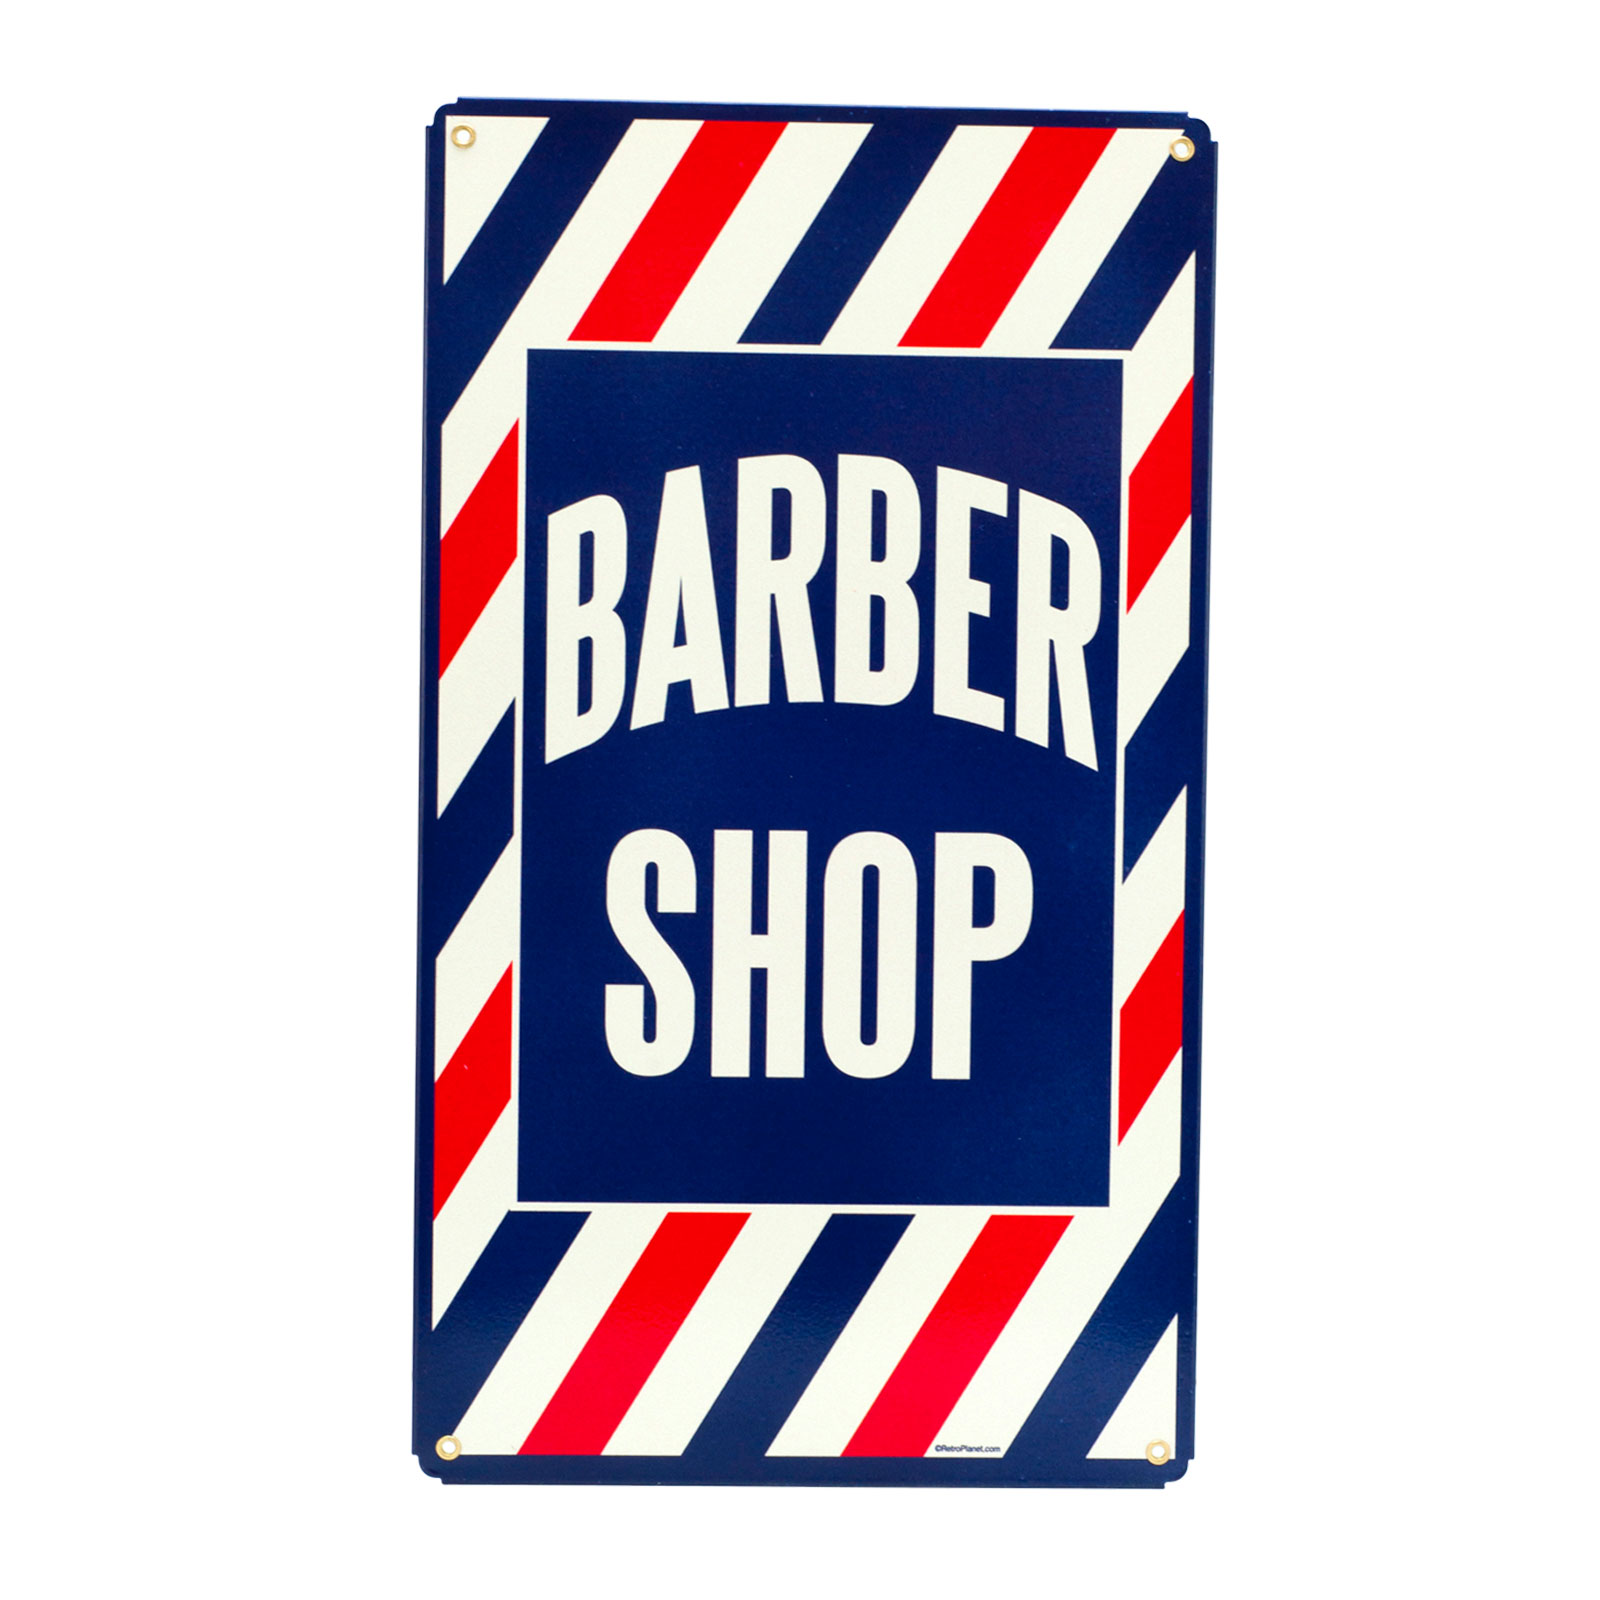 Barber Shop Pictures.